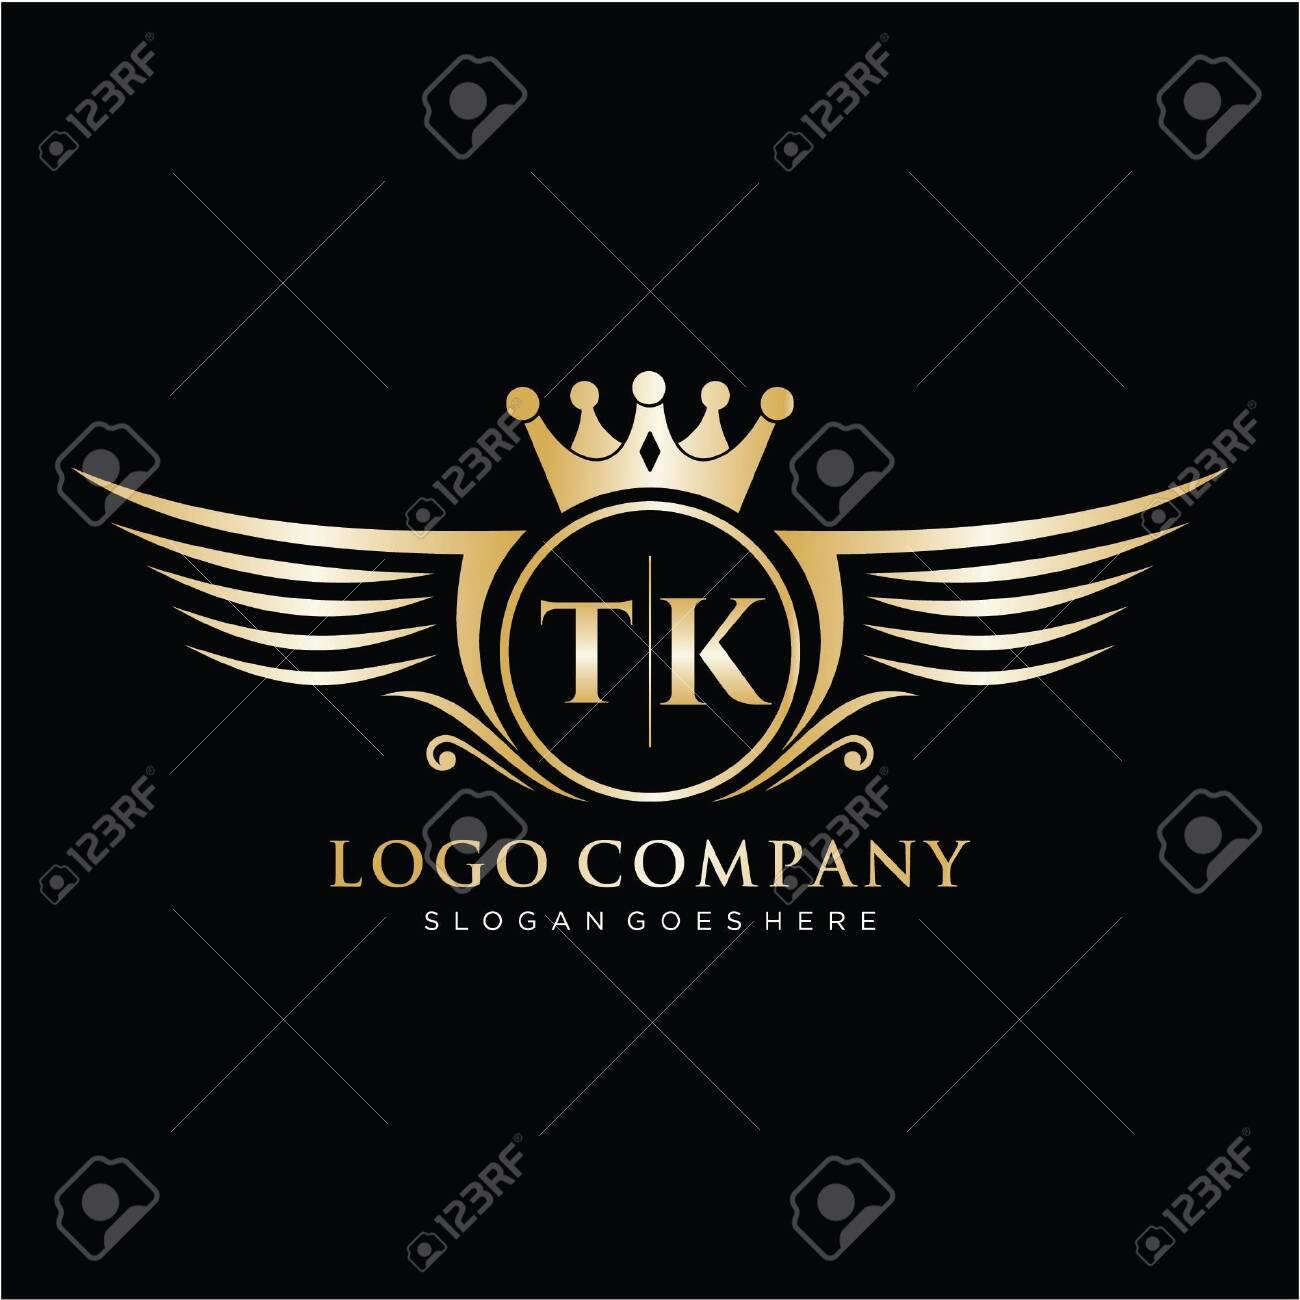 Initial handwriting logo design beautiful design handwritten logo for fashion, team, wedding, luxury logo. - 148627870